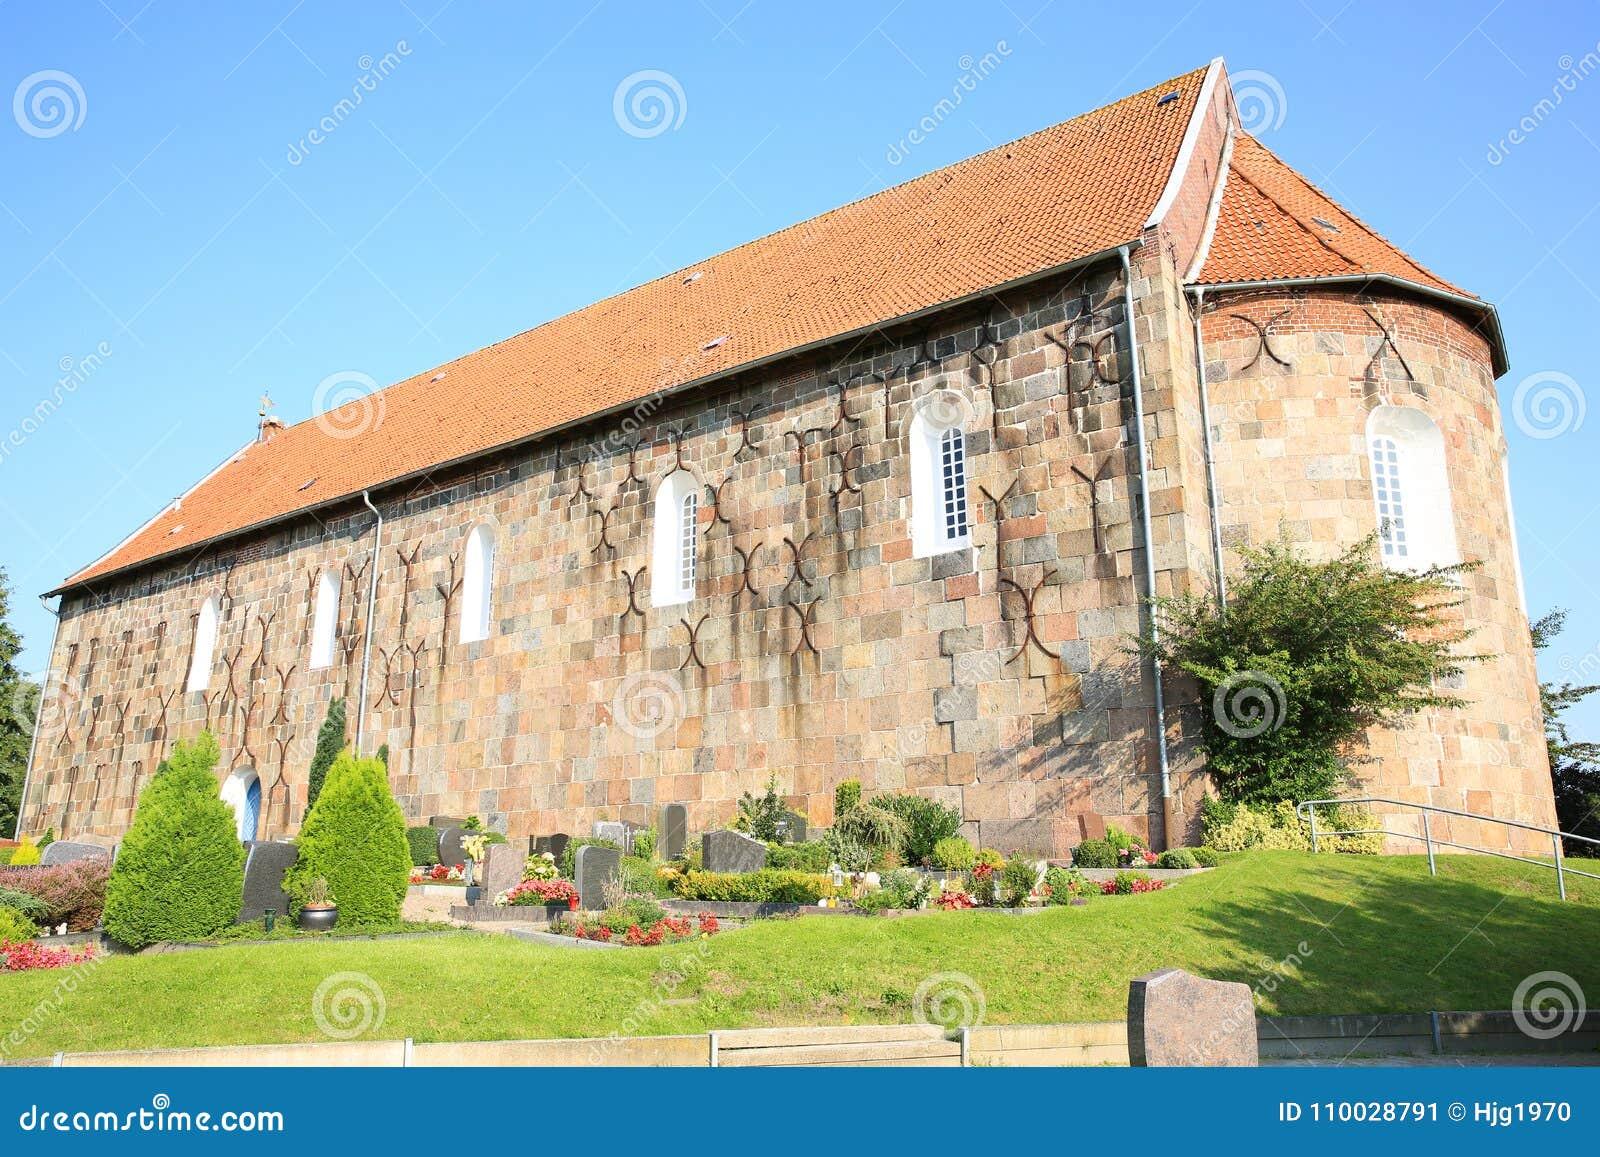 Historische en mooie Lutheran Heilige Florian Church in Sillenstede, Friesland, Nedersaksen, Duitsland